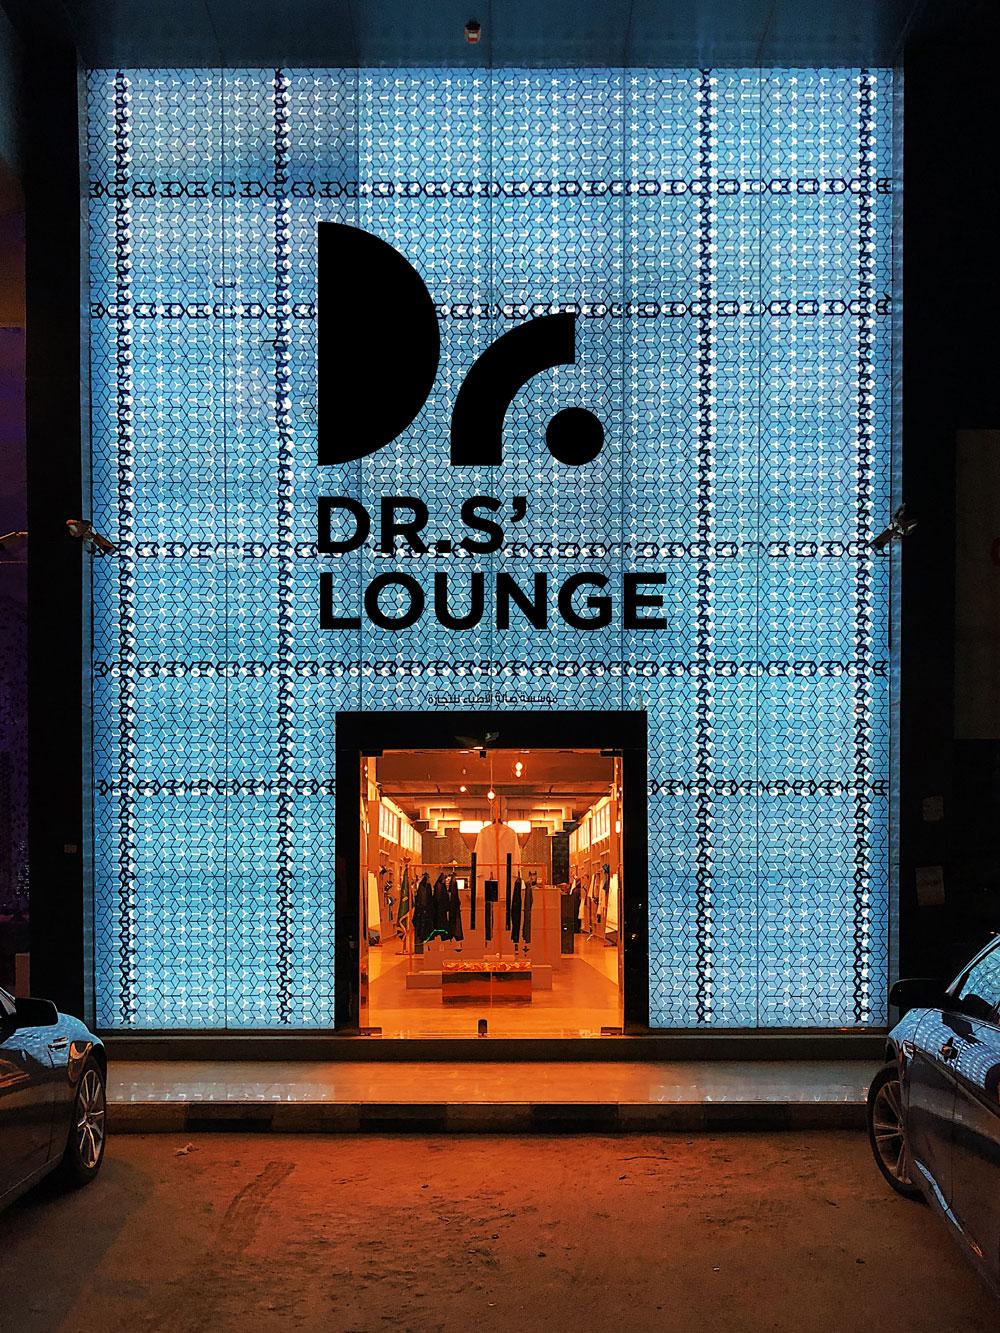 Dr.s' Lounge دكتورز لونج - Identity Design by YaStudio